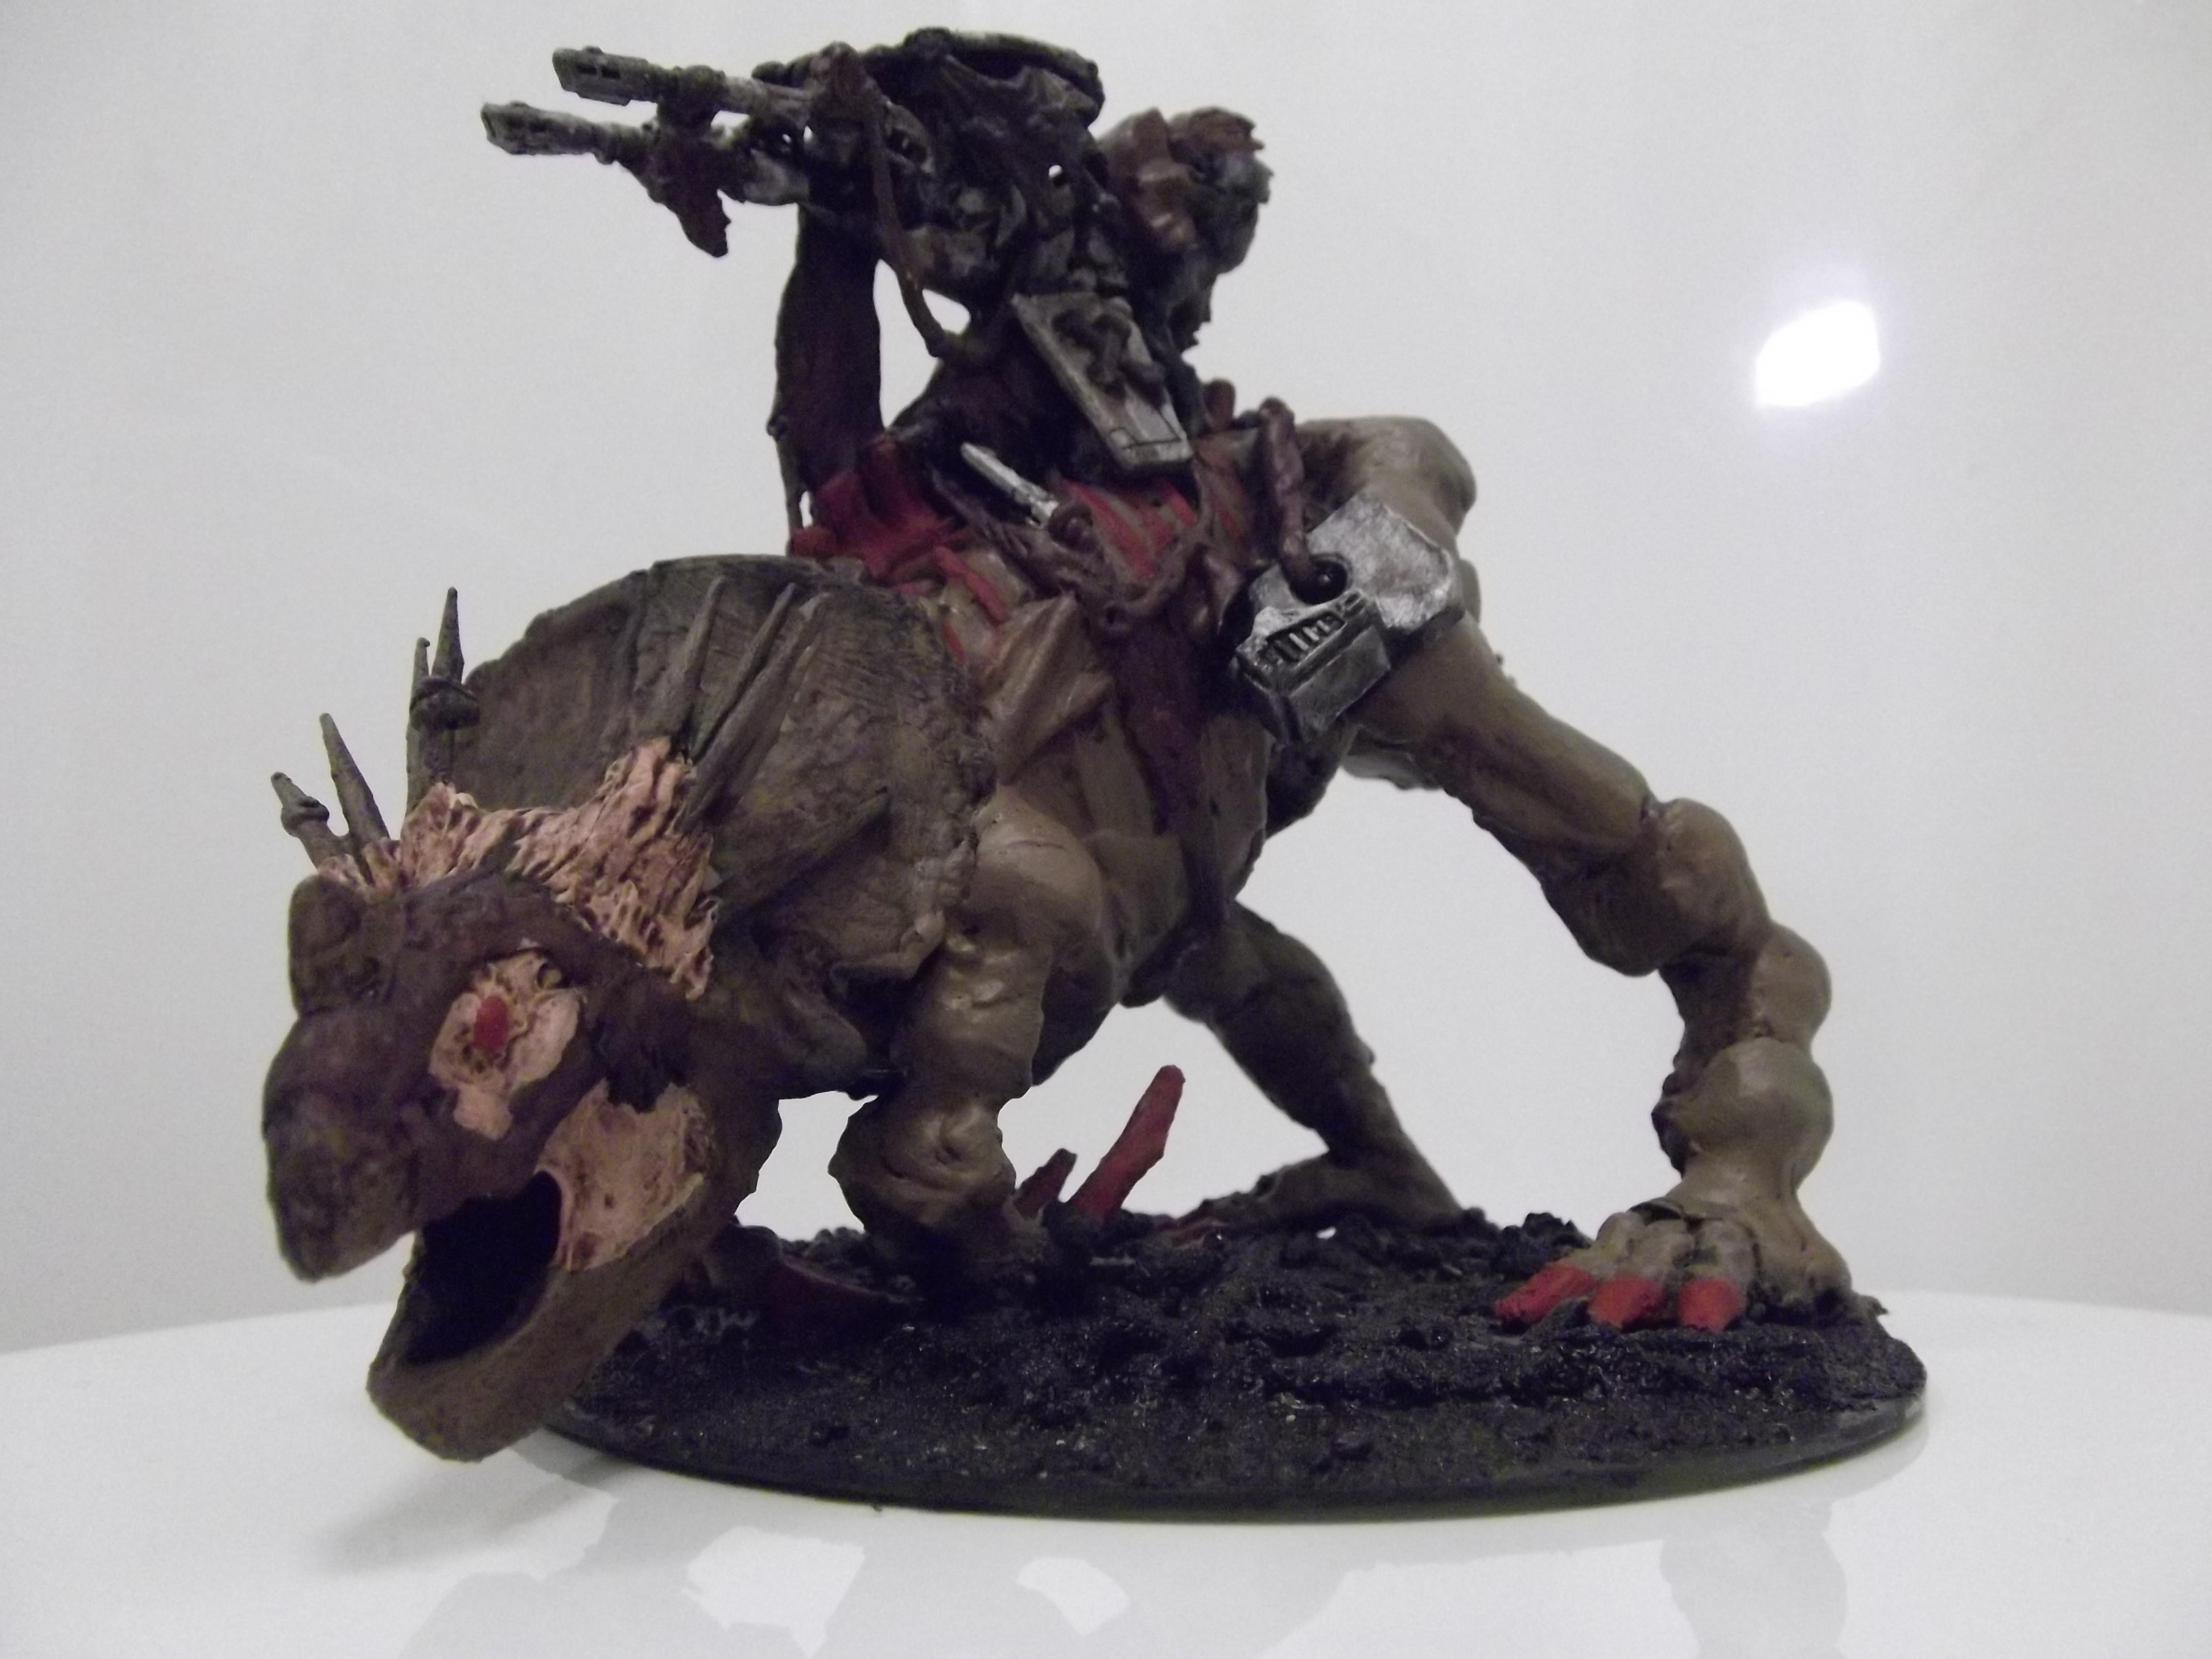 Conversion, Greater Knarloc, Knarloc, Kroot, Scratch Build, Sculpting